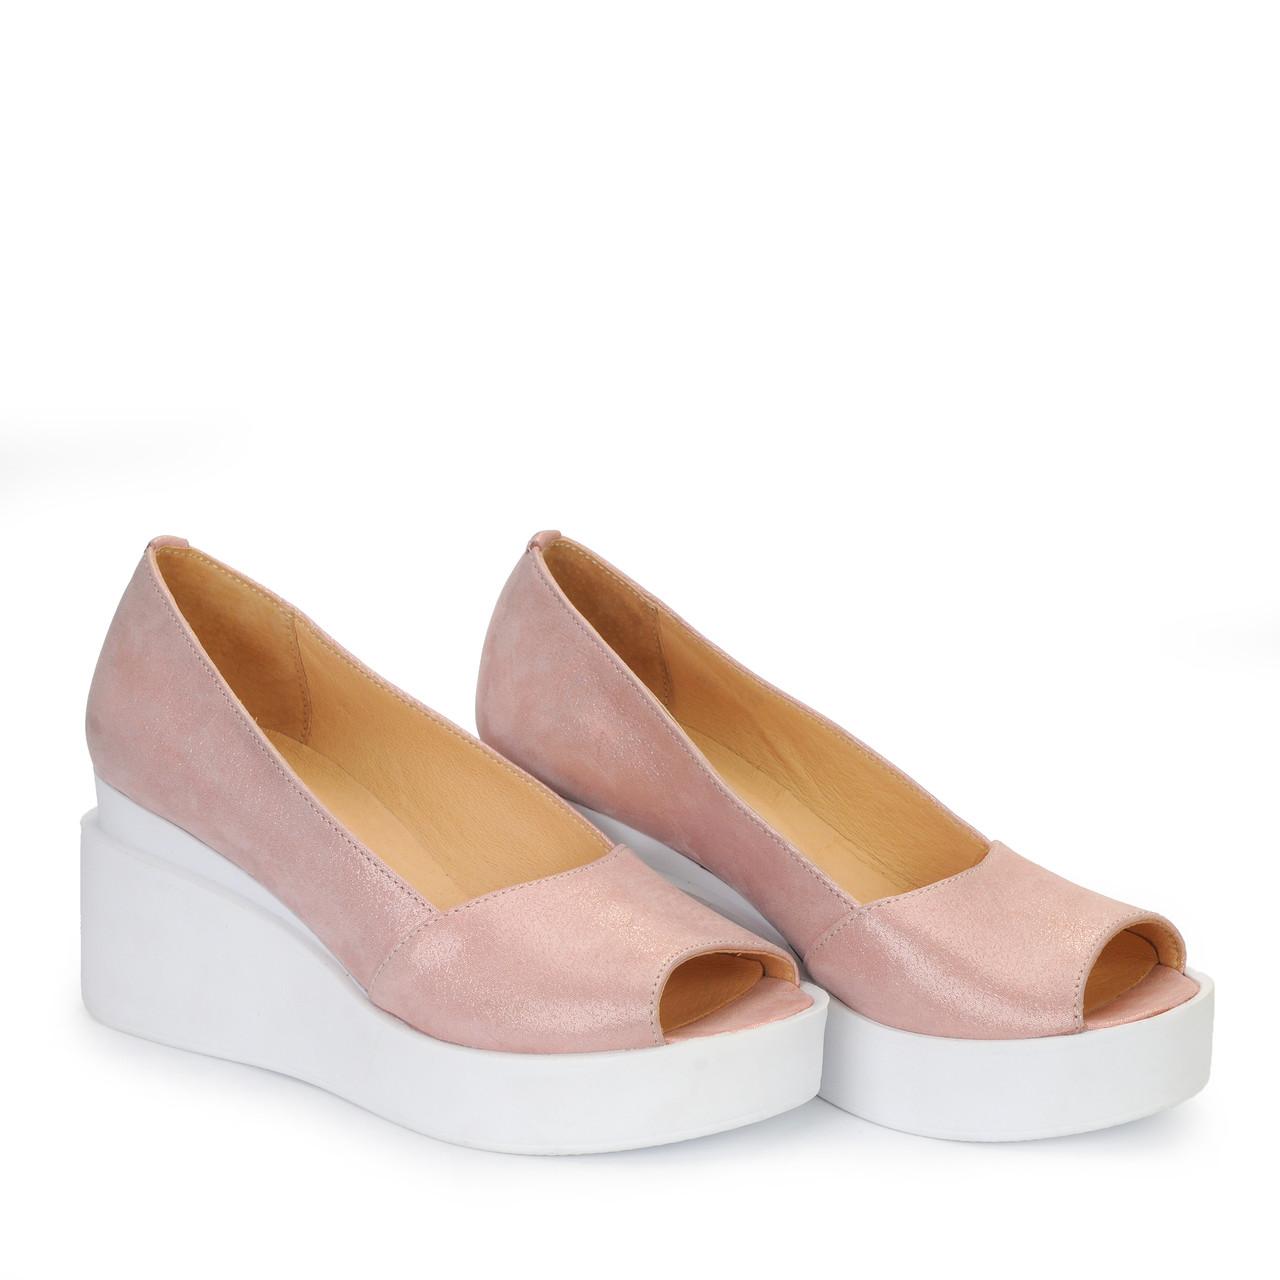 Женские кожаные туфли балетки босоножки на танкетке TIFFANY